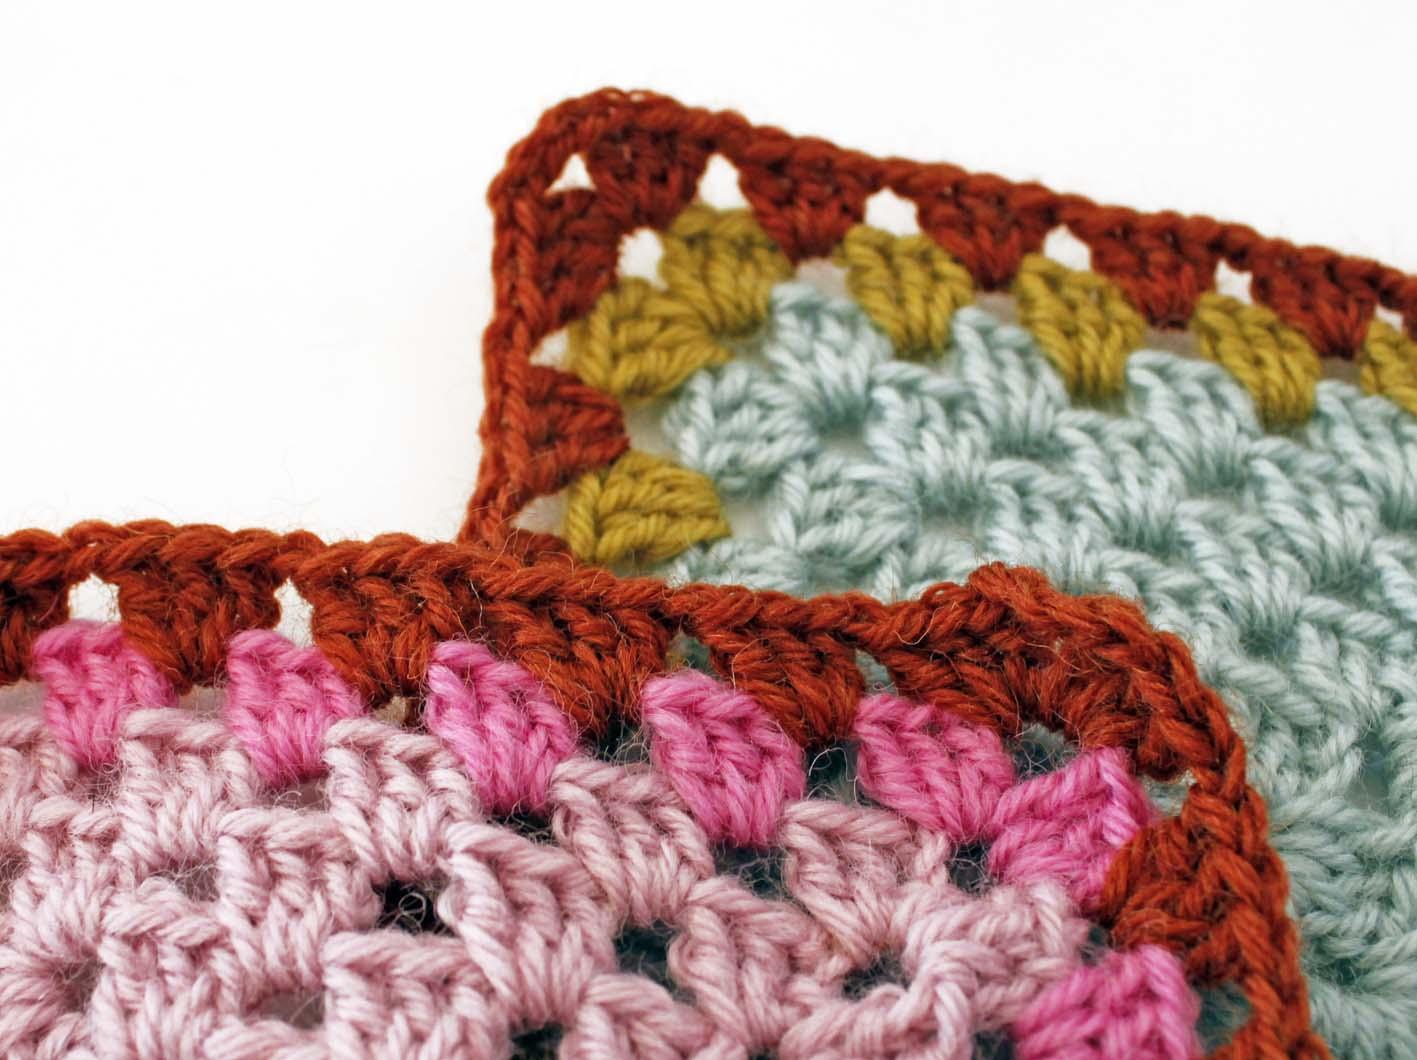 Beginners Crochet Workshop - The Corner Store Gallery, Orange NSW